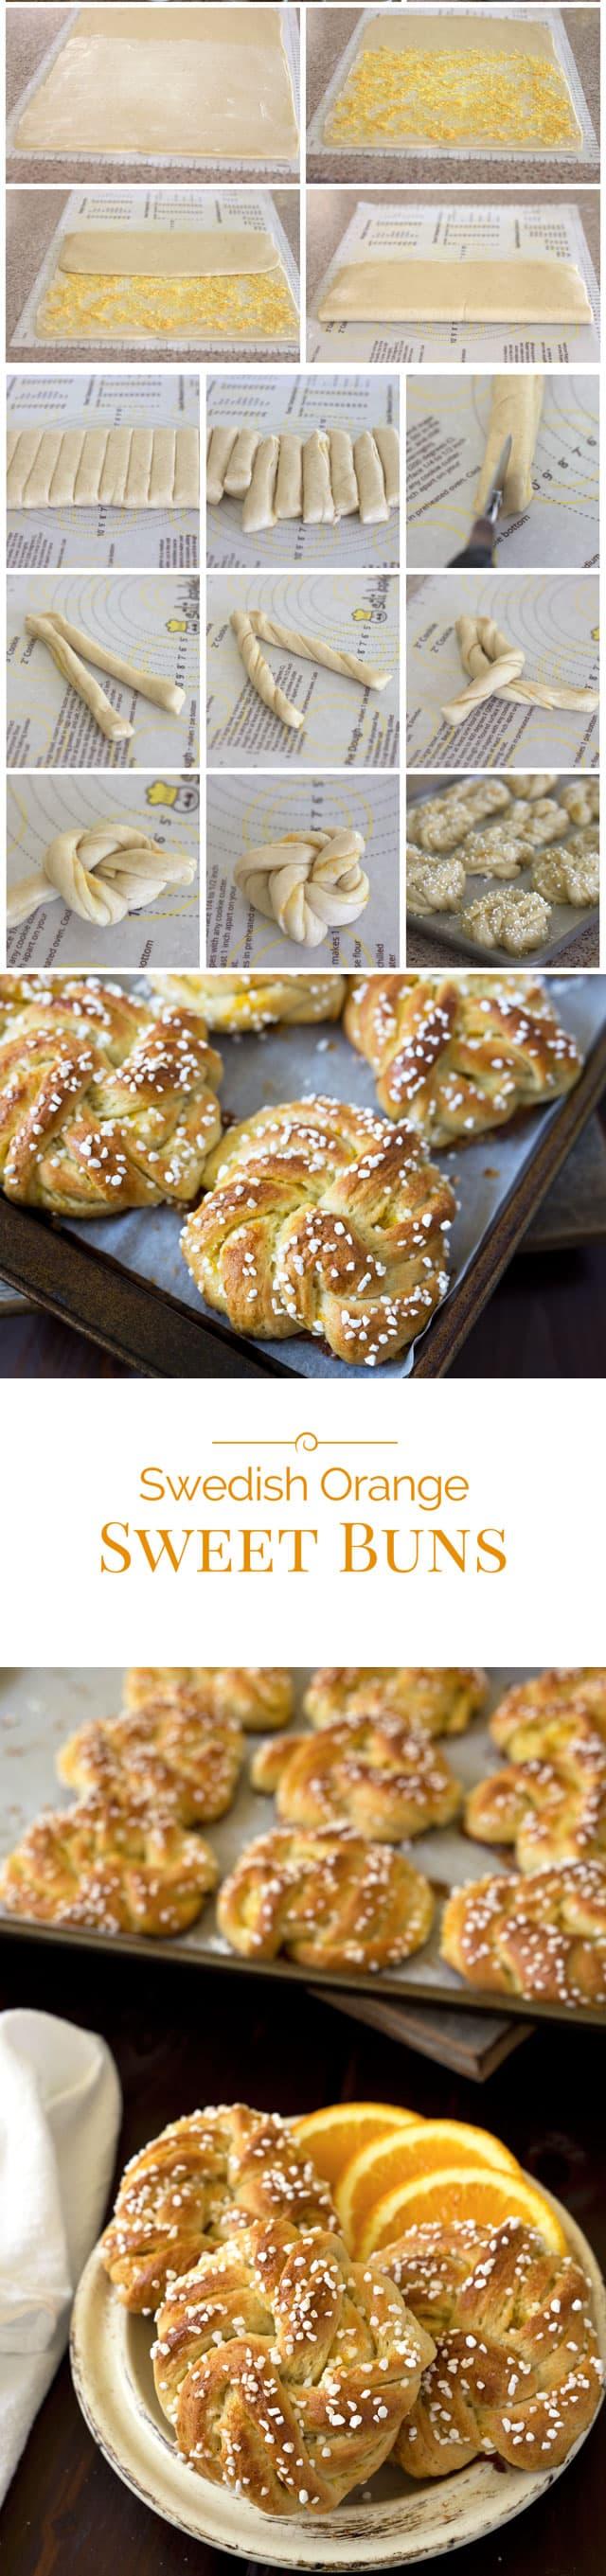 Swedish-Orange-Sweet-Buns-Collage.